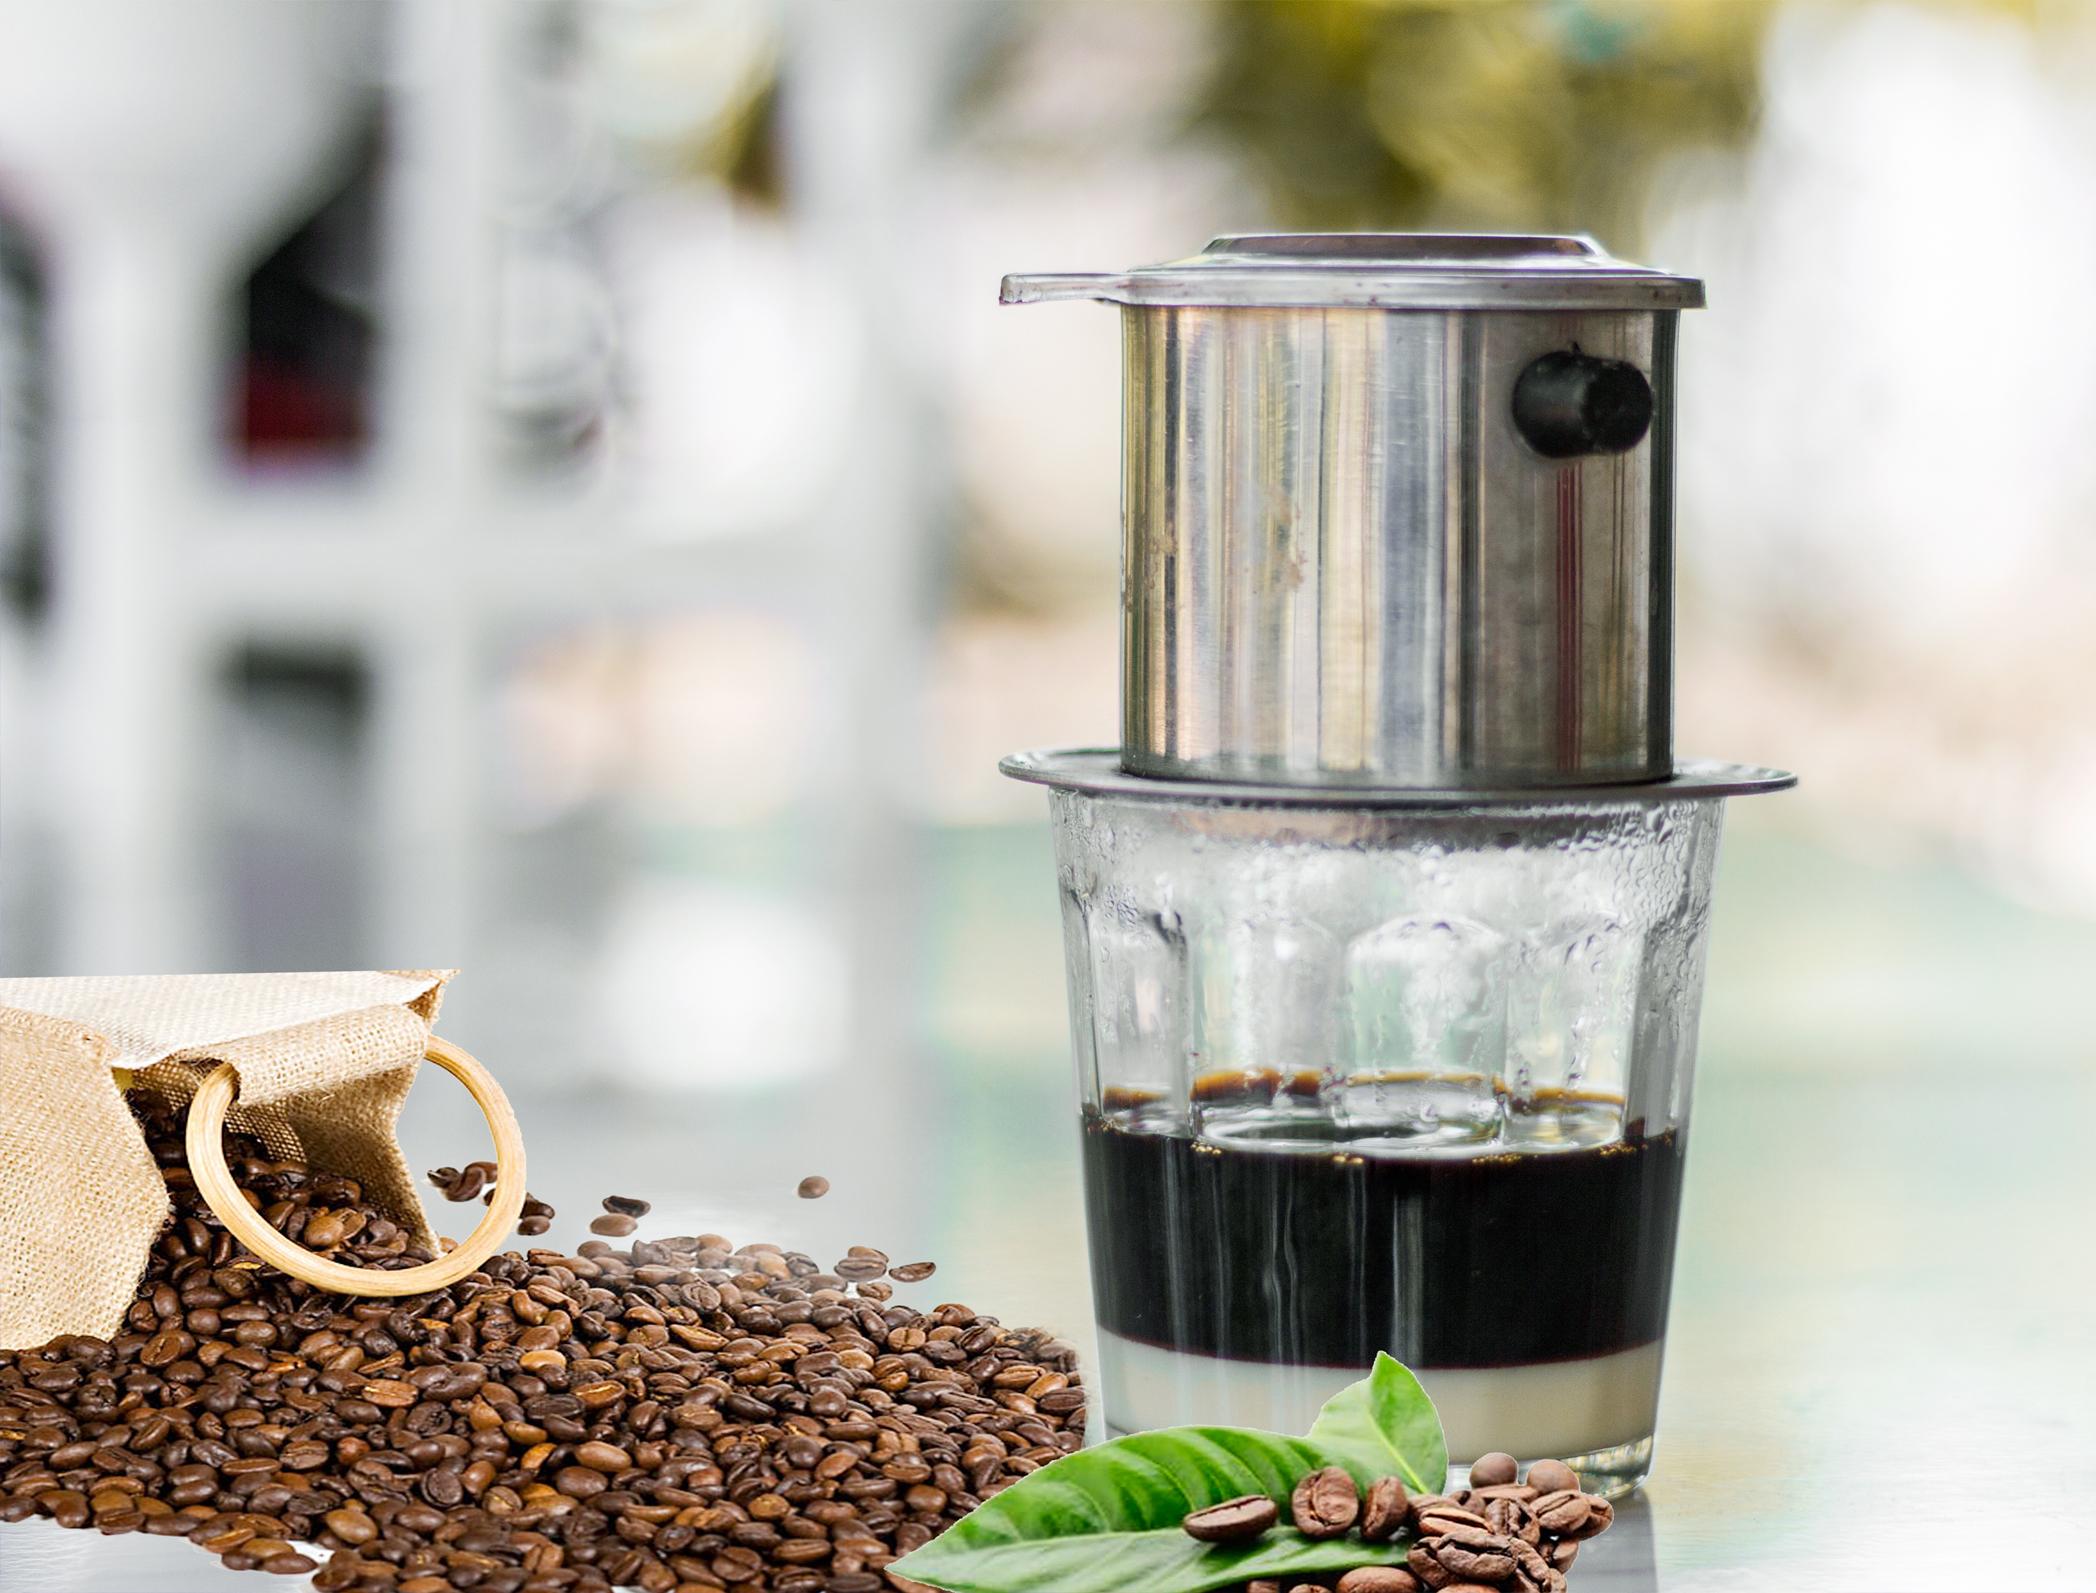 Vietnamese Coffee - $3.49